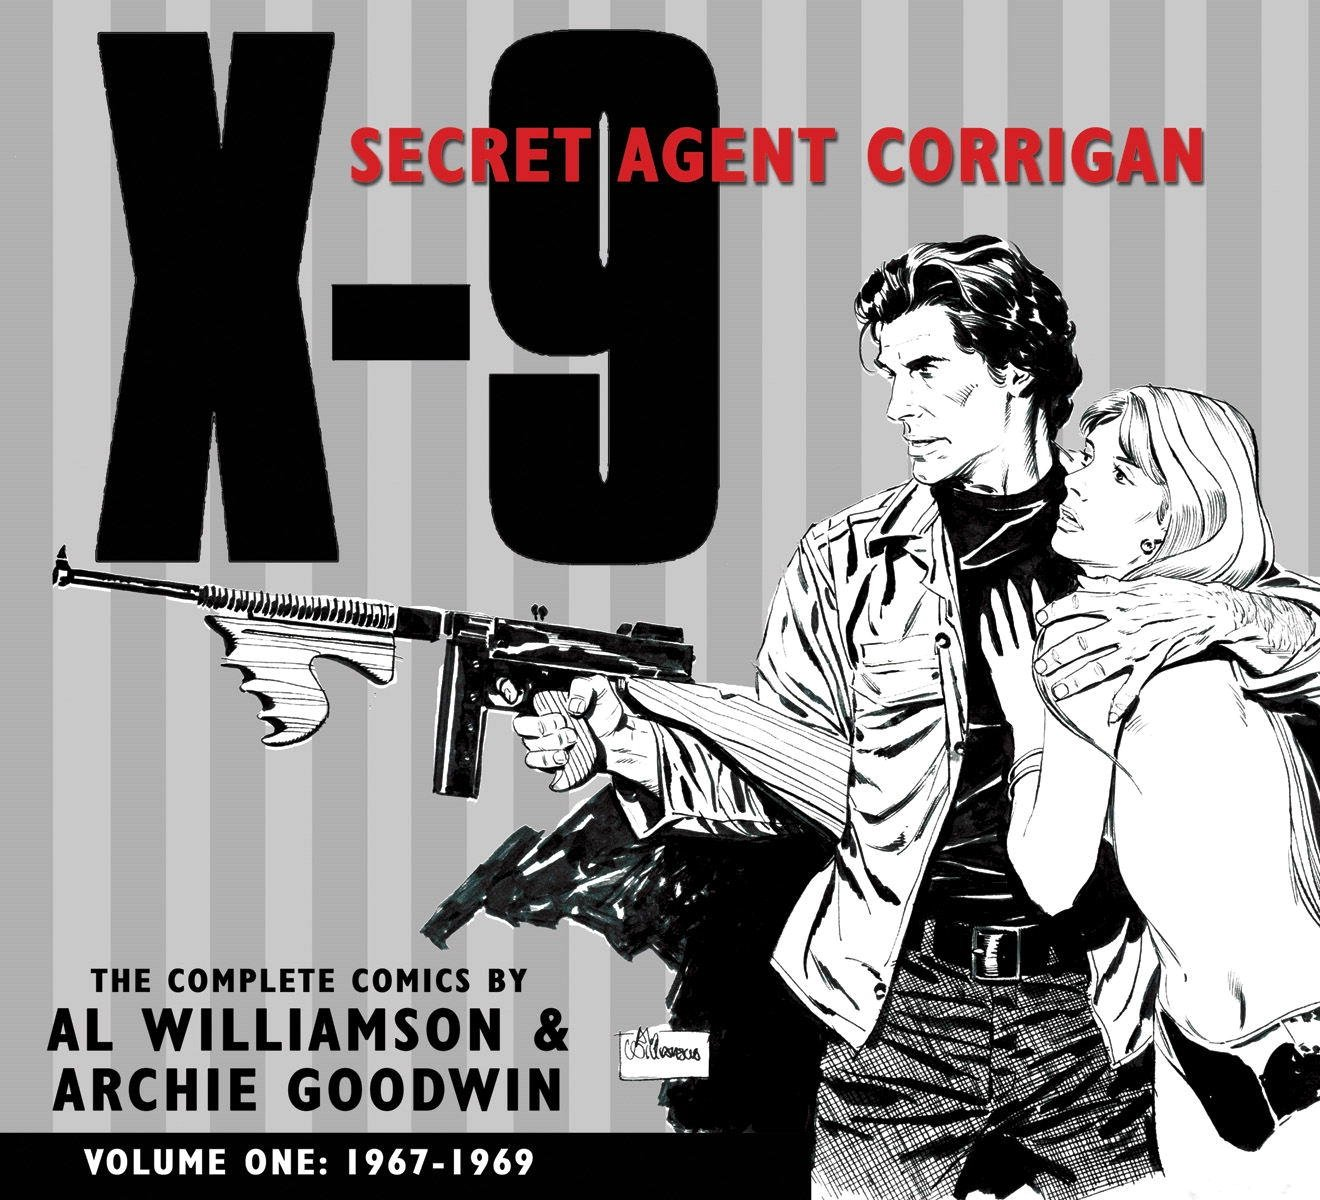 Download X-9: Secret Agent Corrigan Volume 1 pdf